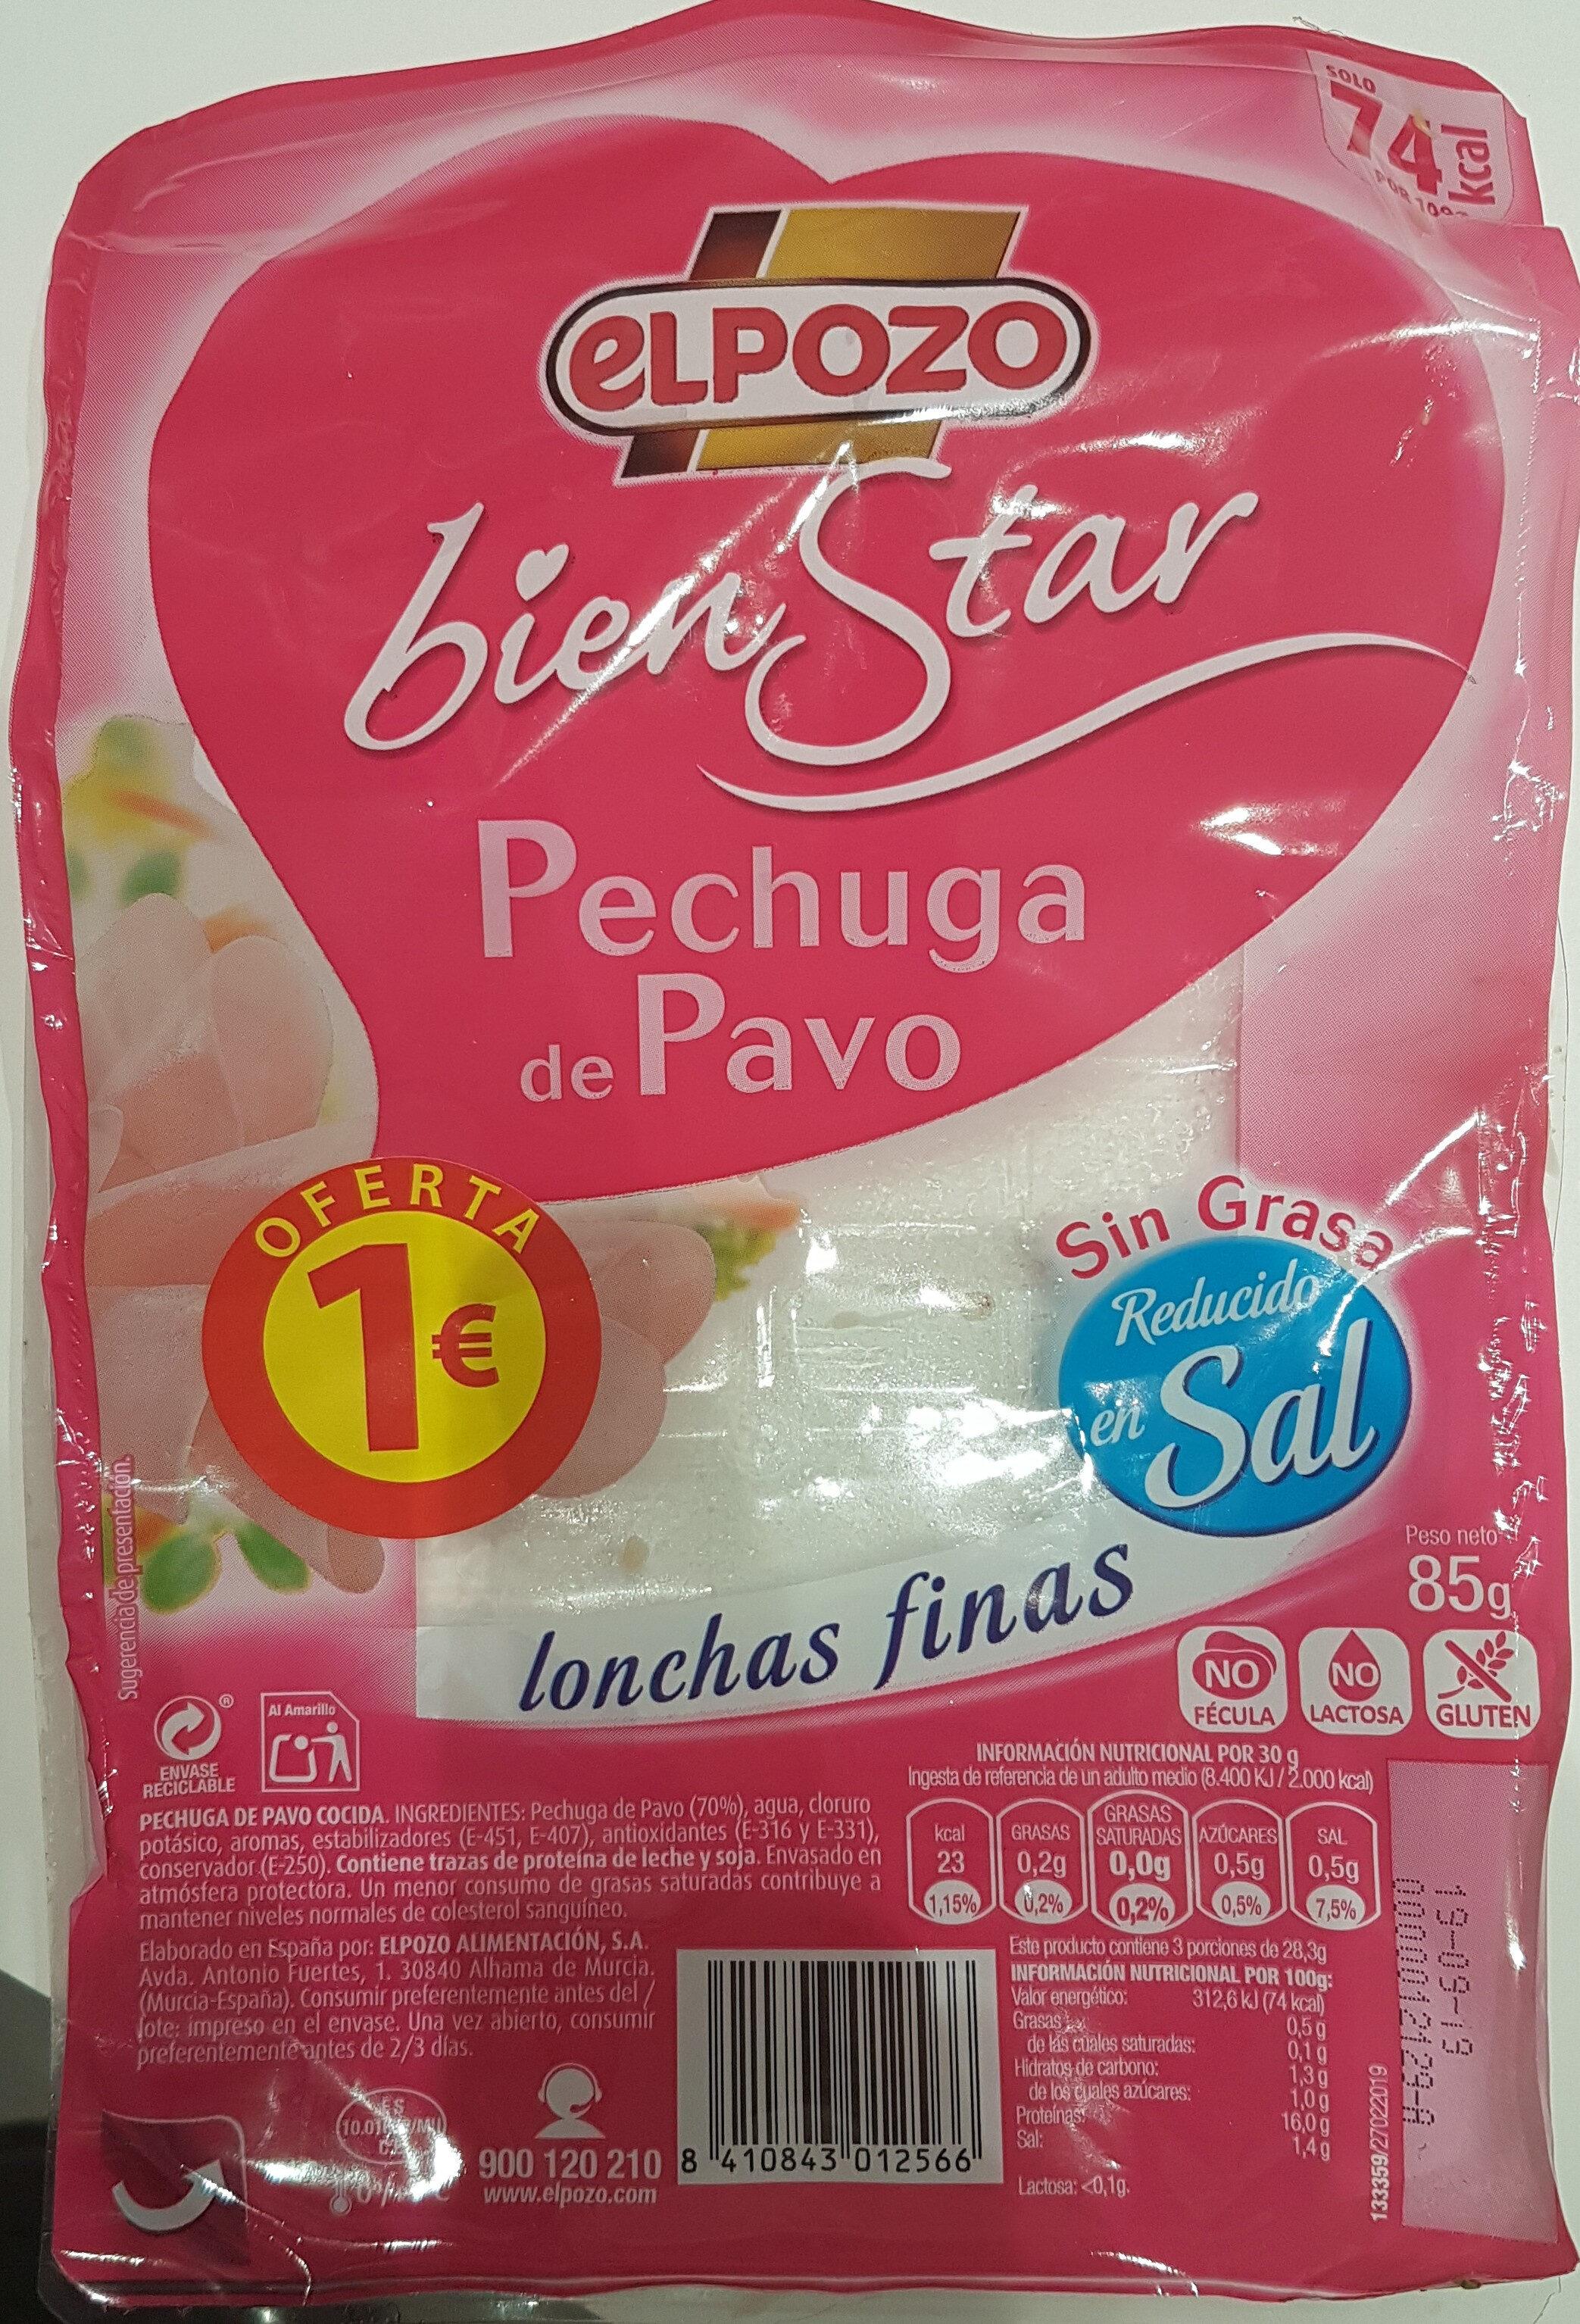 Bien Star pechuga de pavo - Produit - es